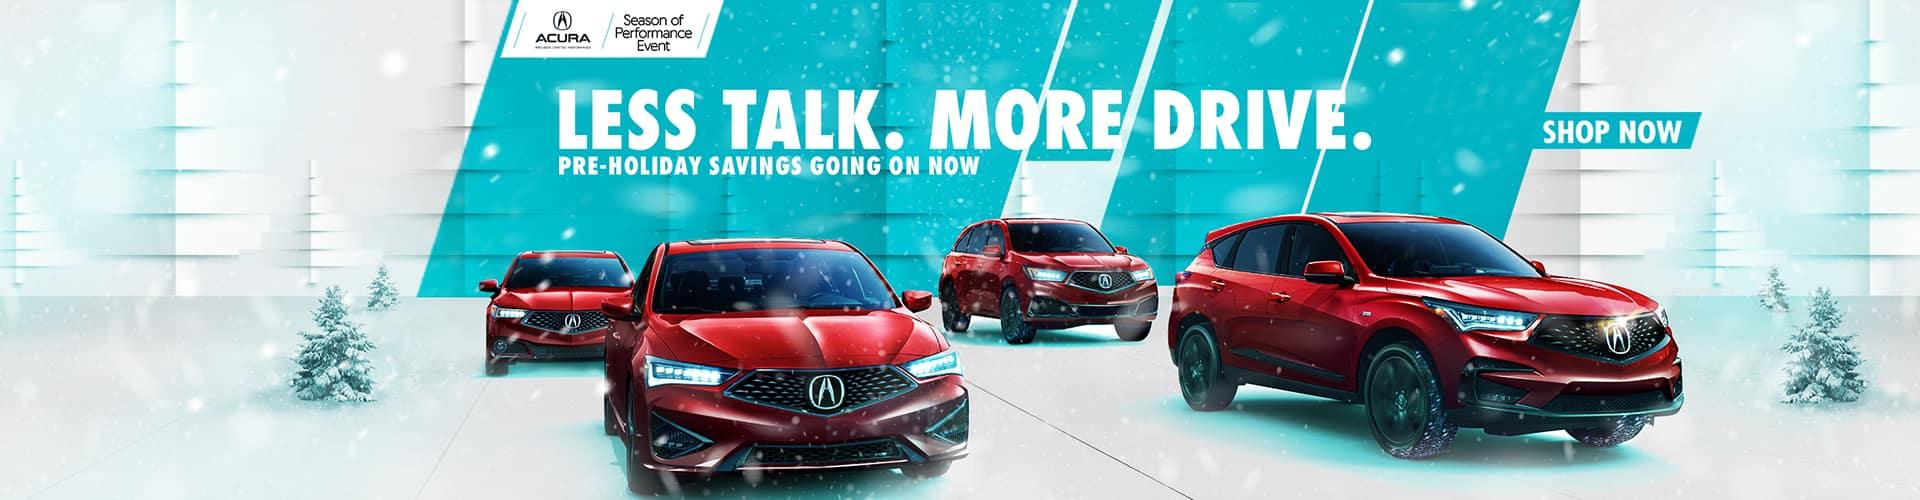 Acura Full Line - Less Talk More Drive.